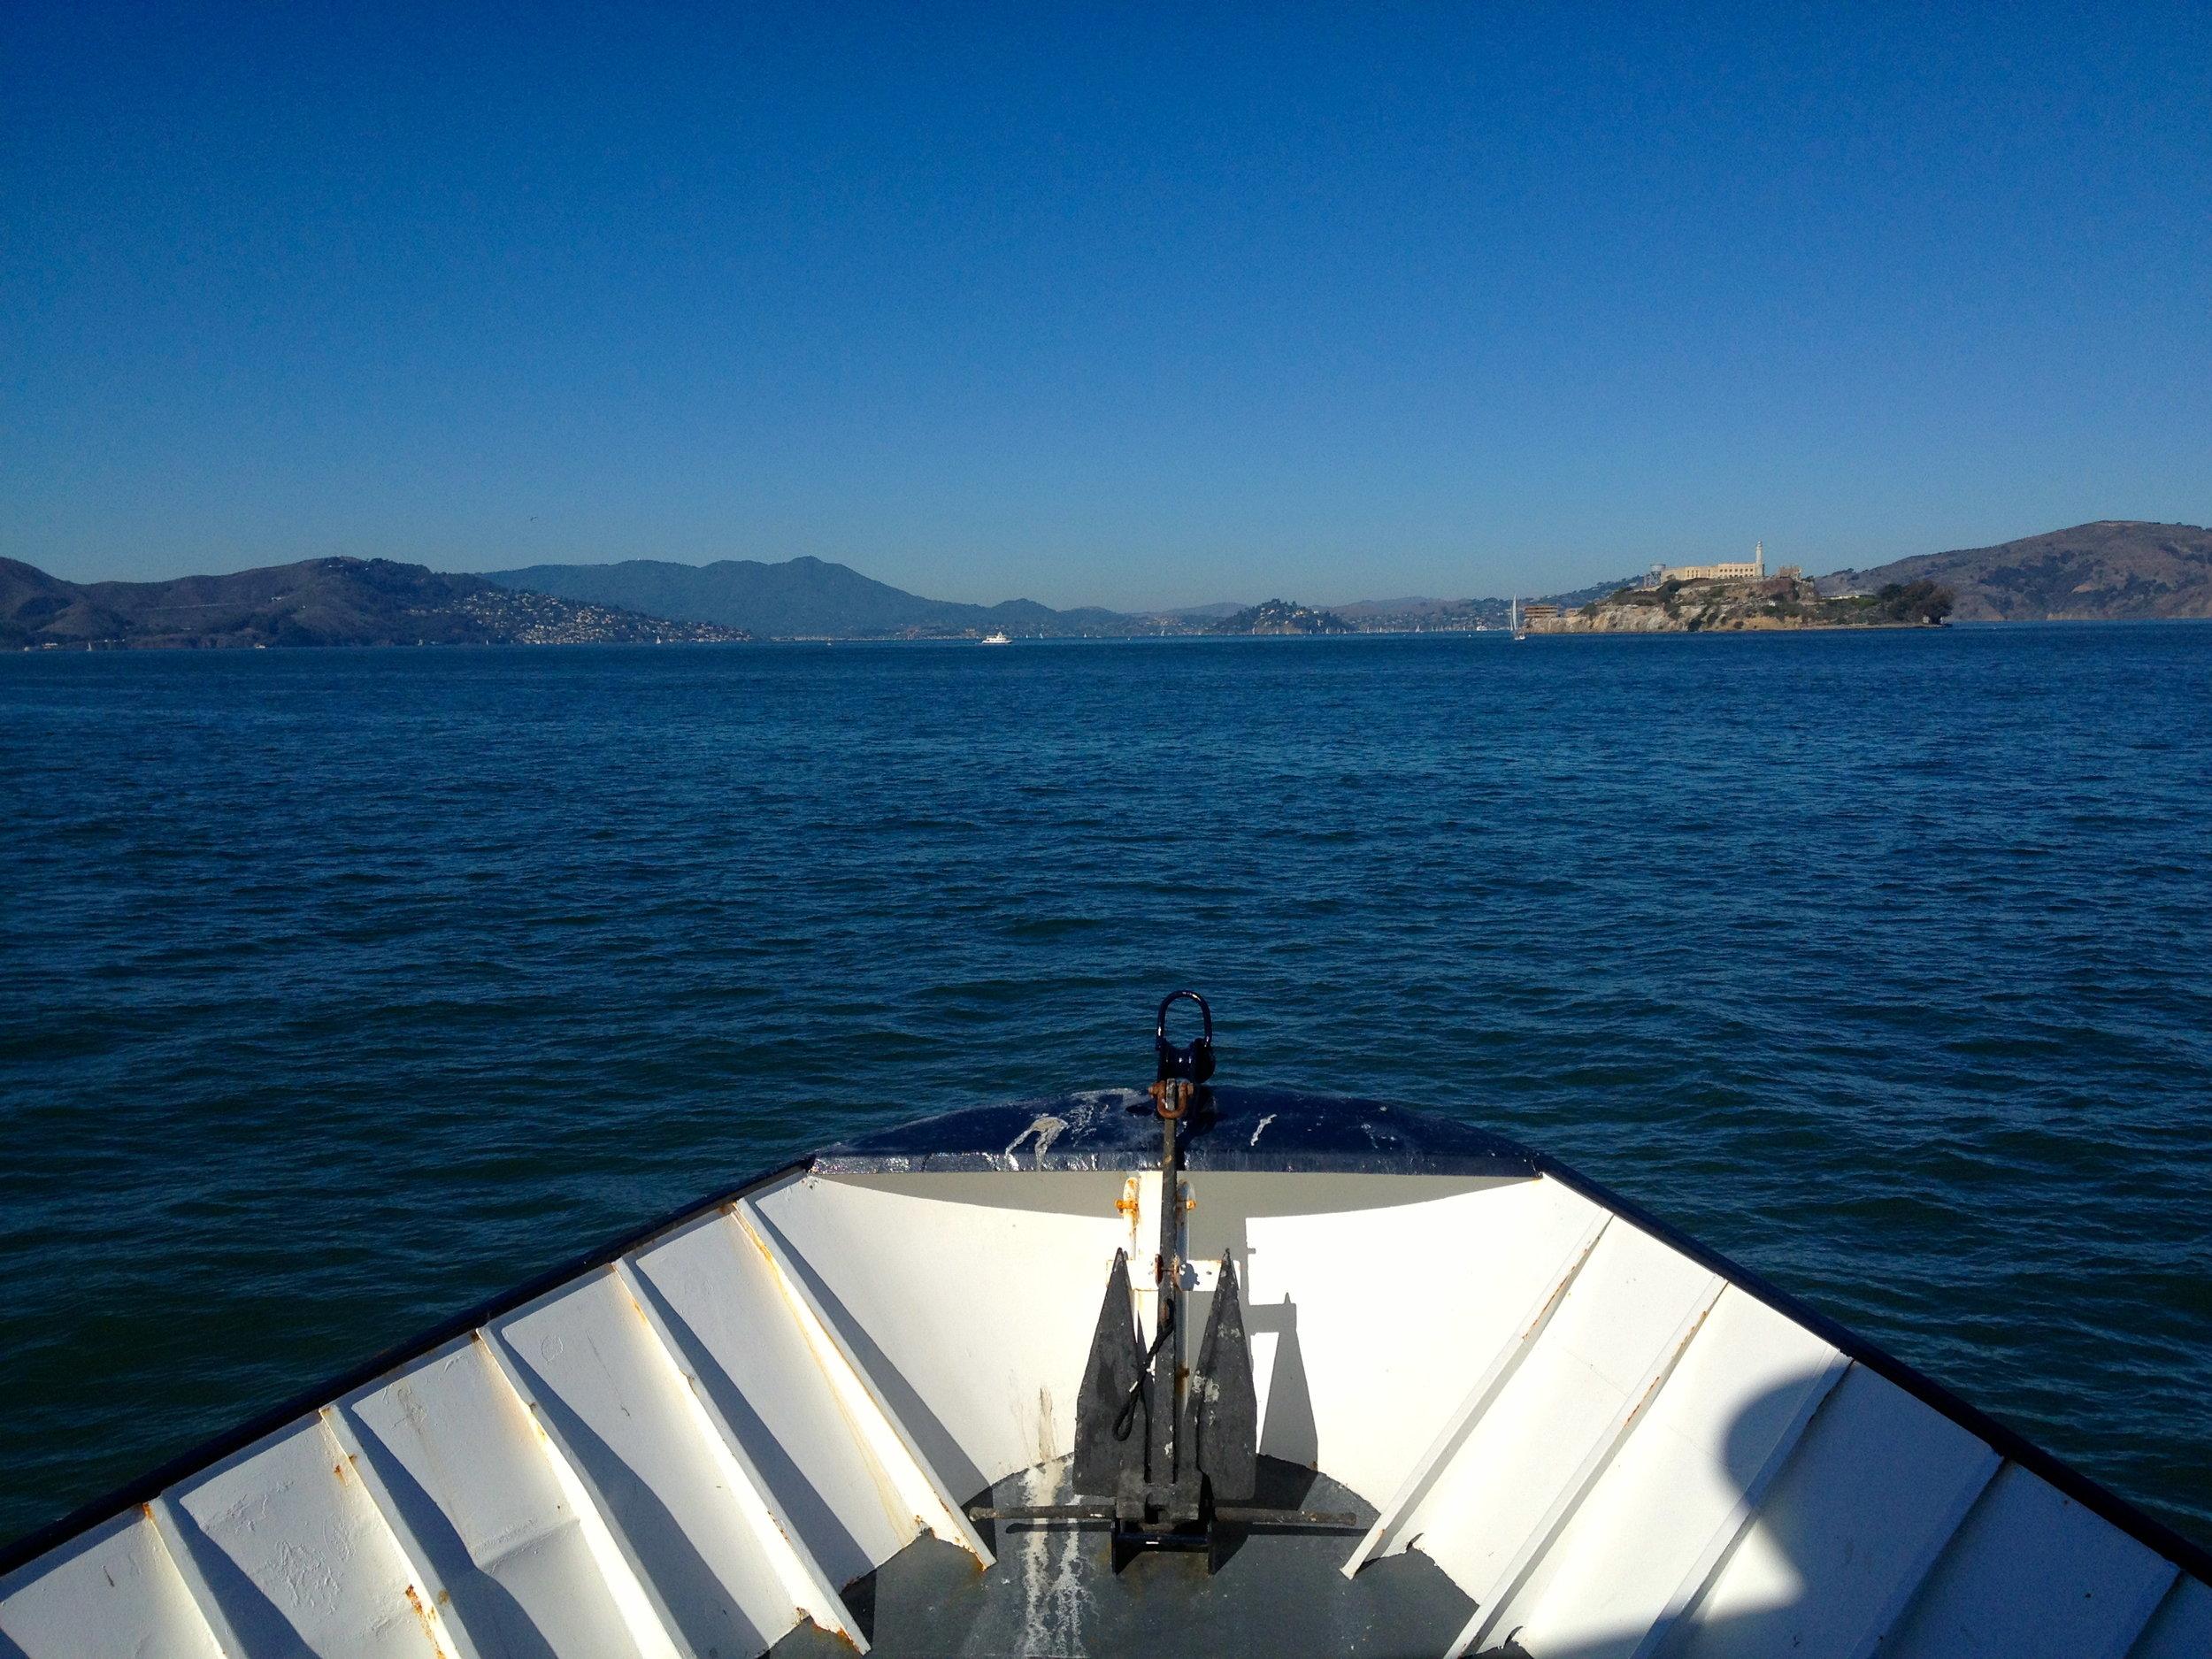 Headed to Tiburon!